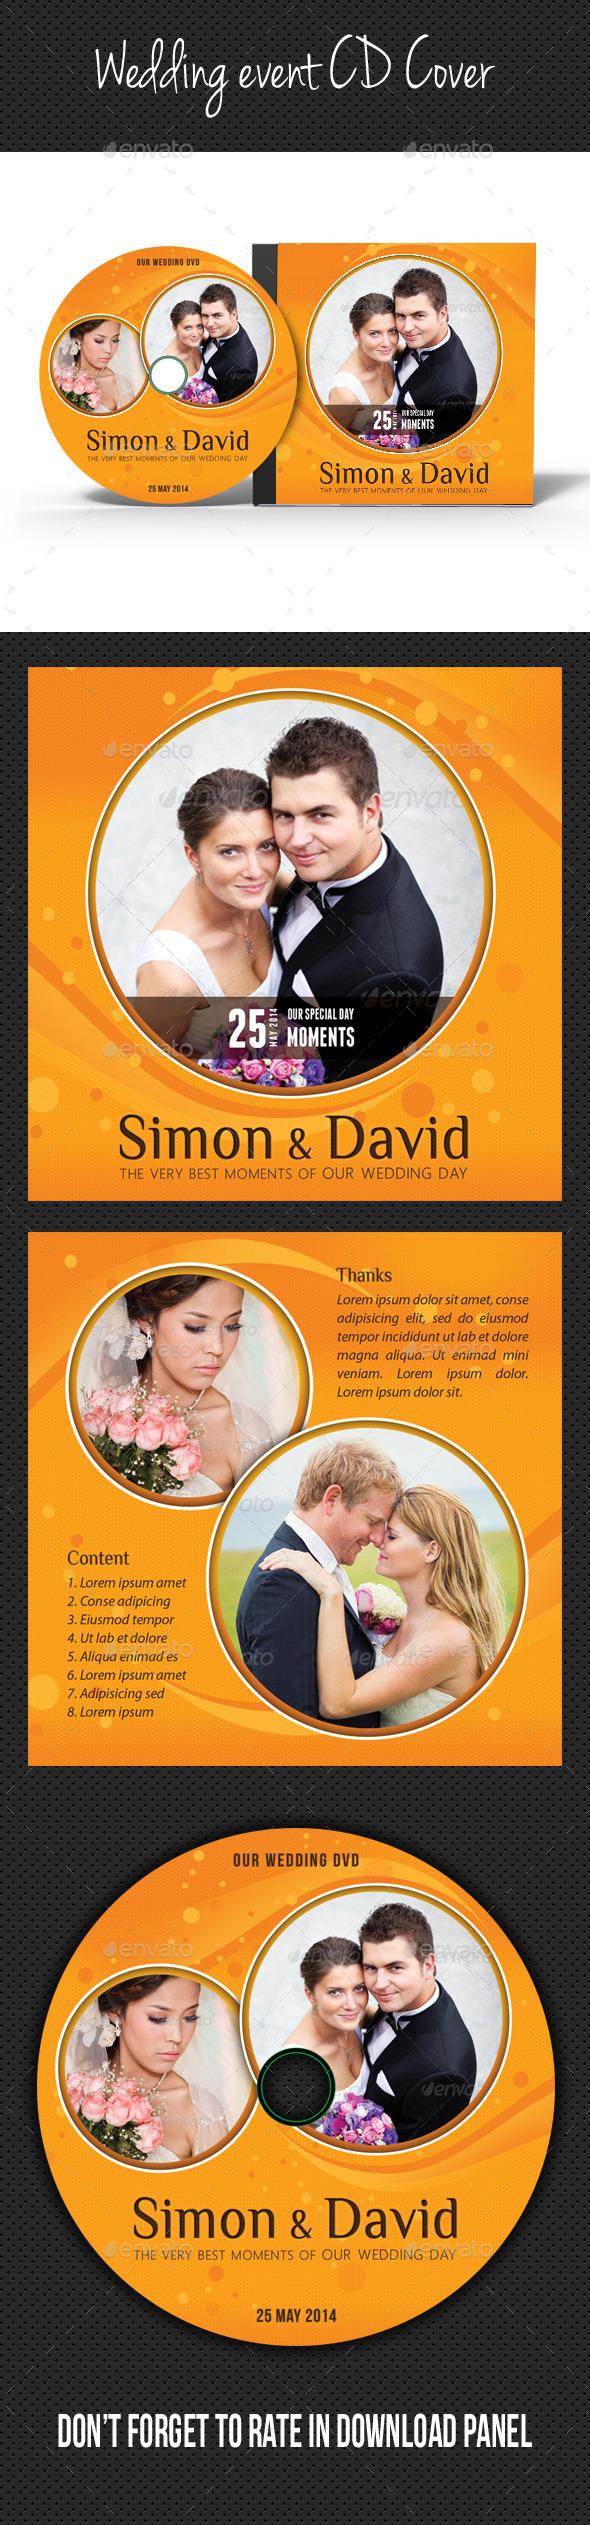 Wedding Event CD Cover V03 - CD & DVD Artwork Print Templates